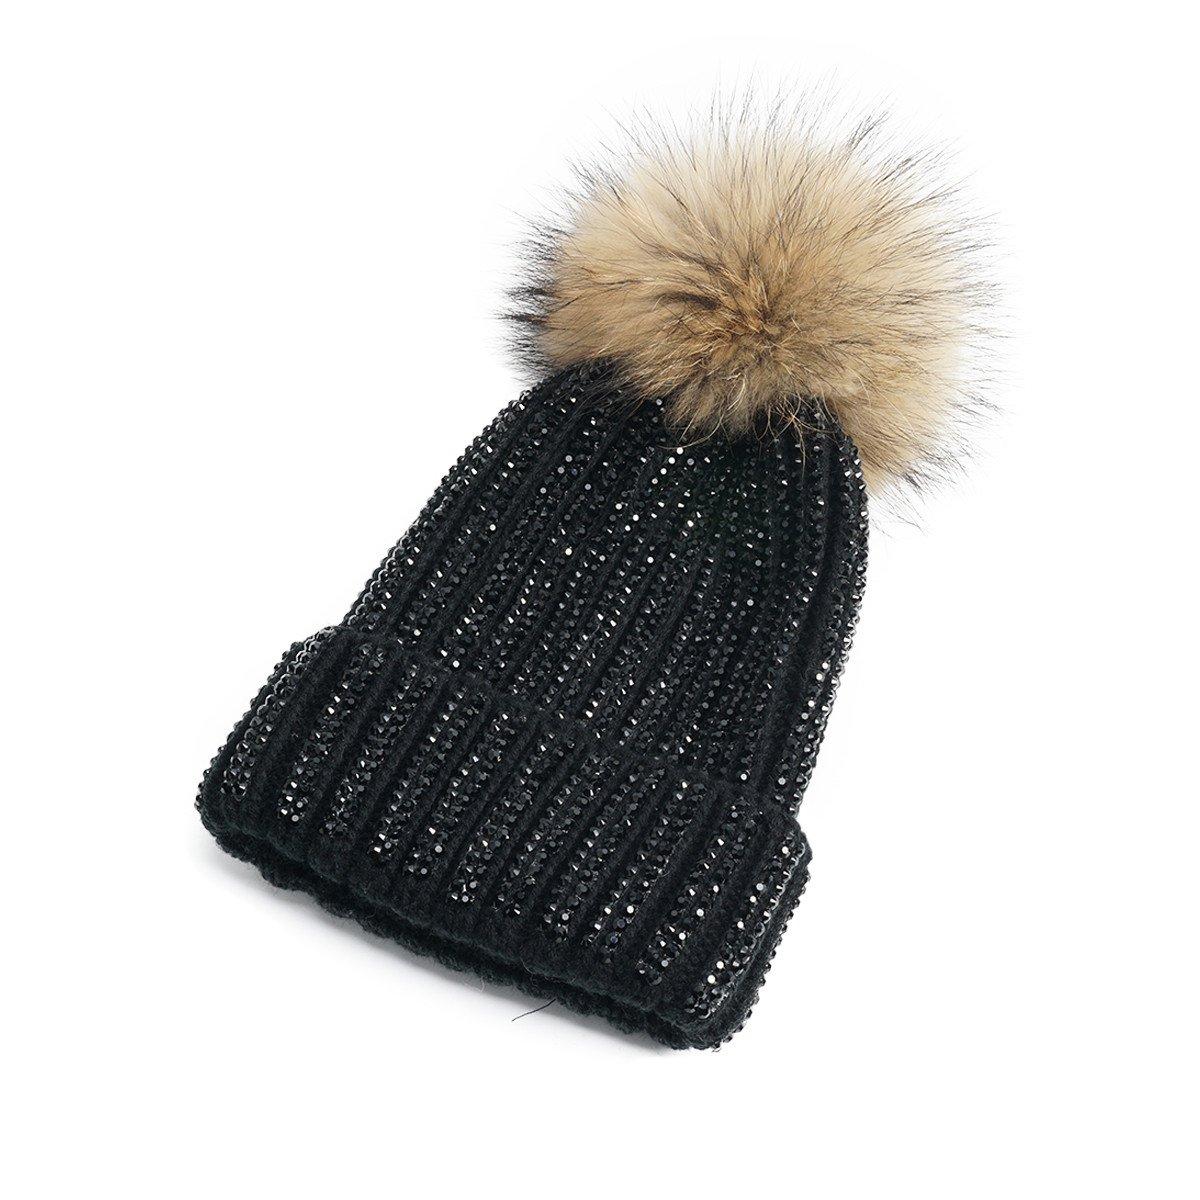 903cd159e4b Lawliet Lady Rhinestone Bling Fur Pom Pom Knit Snow Beanie Ski Hat Skull Cap  A391 (All Black) at Amazon Women s Clothing store